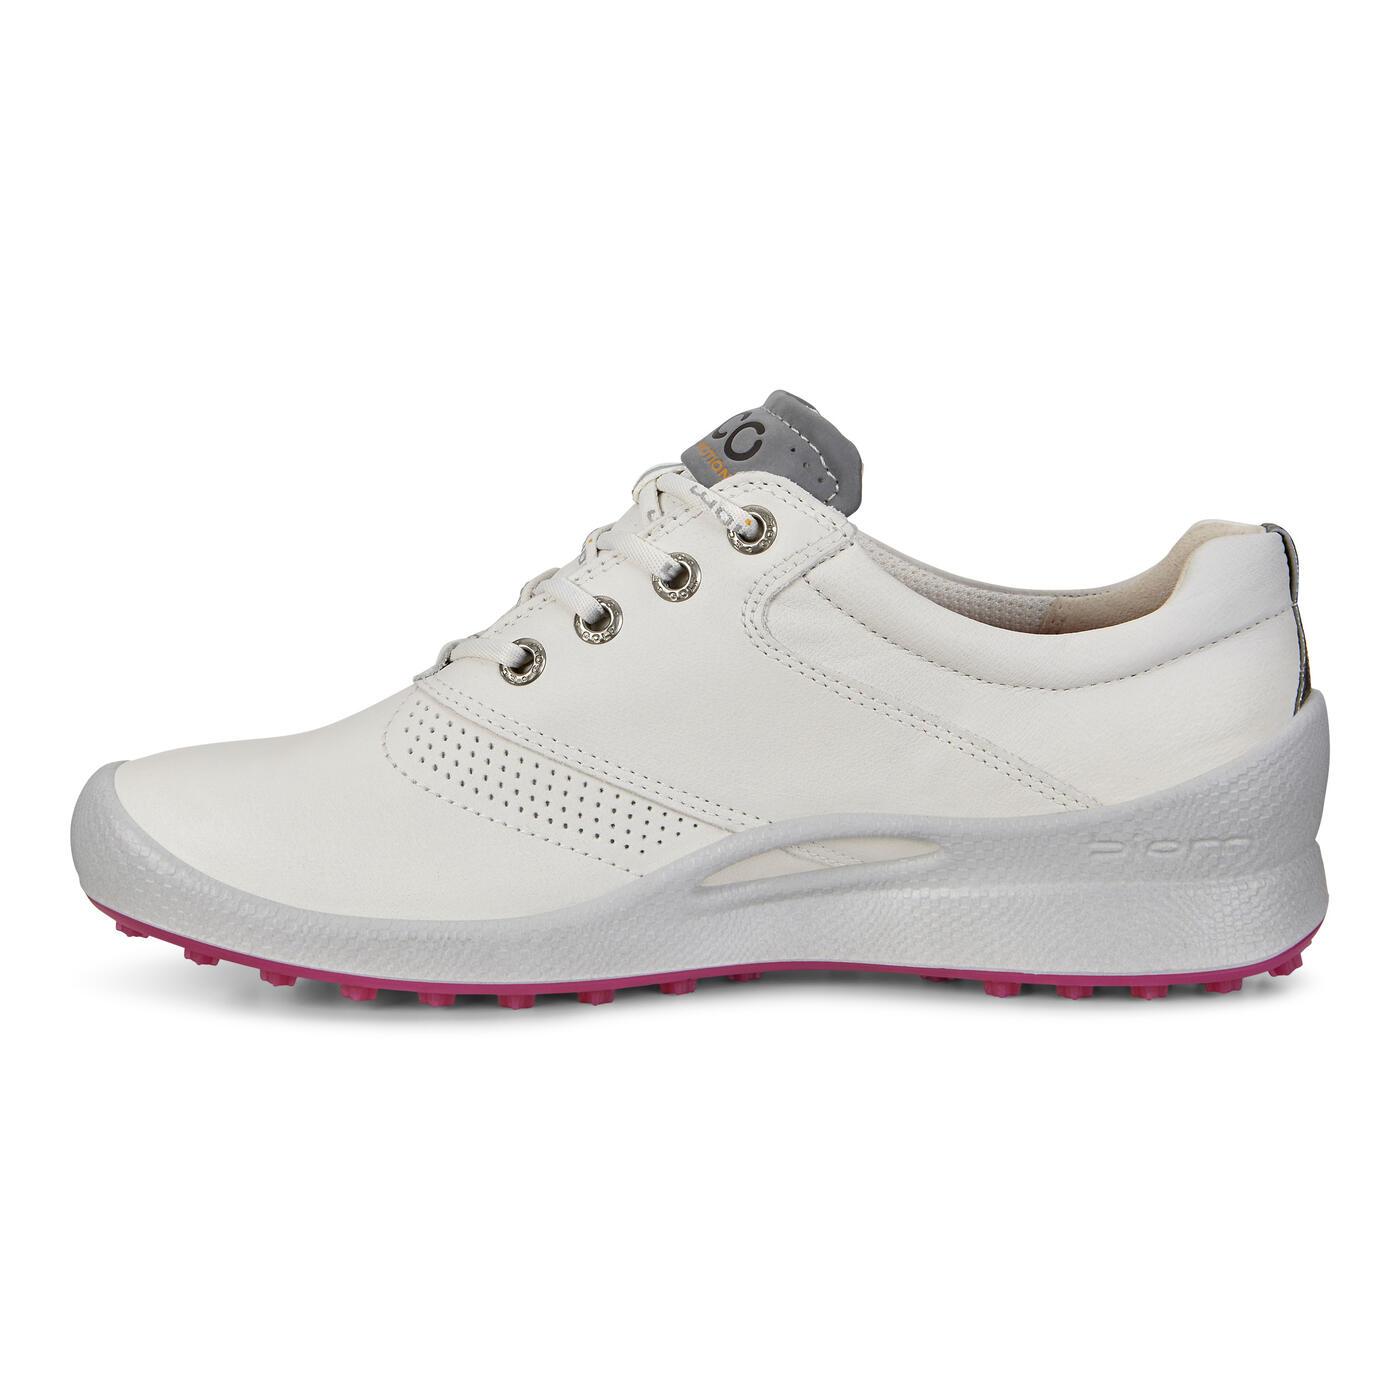 ECCO BIOM Hybrid Golf pour femmes